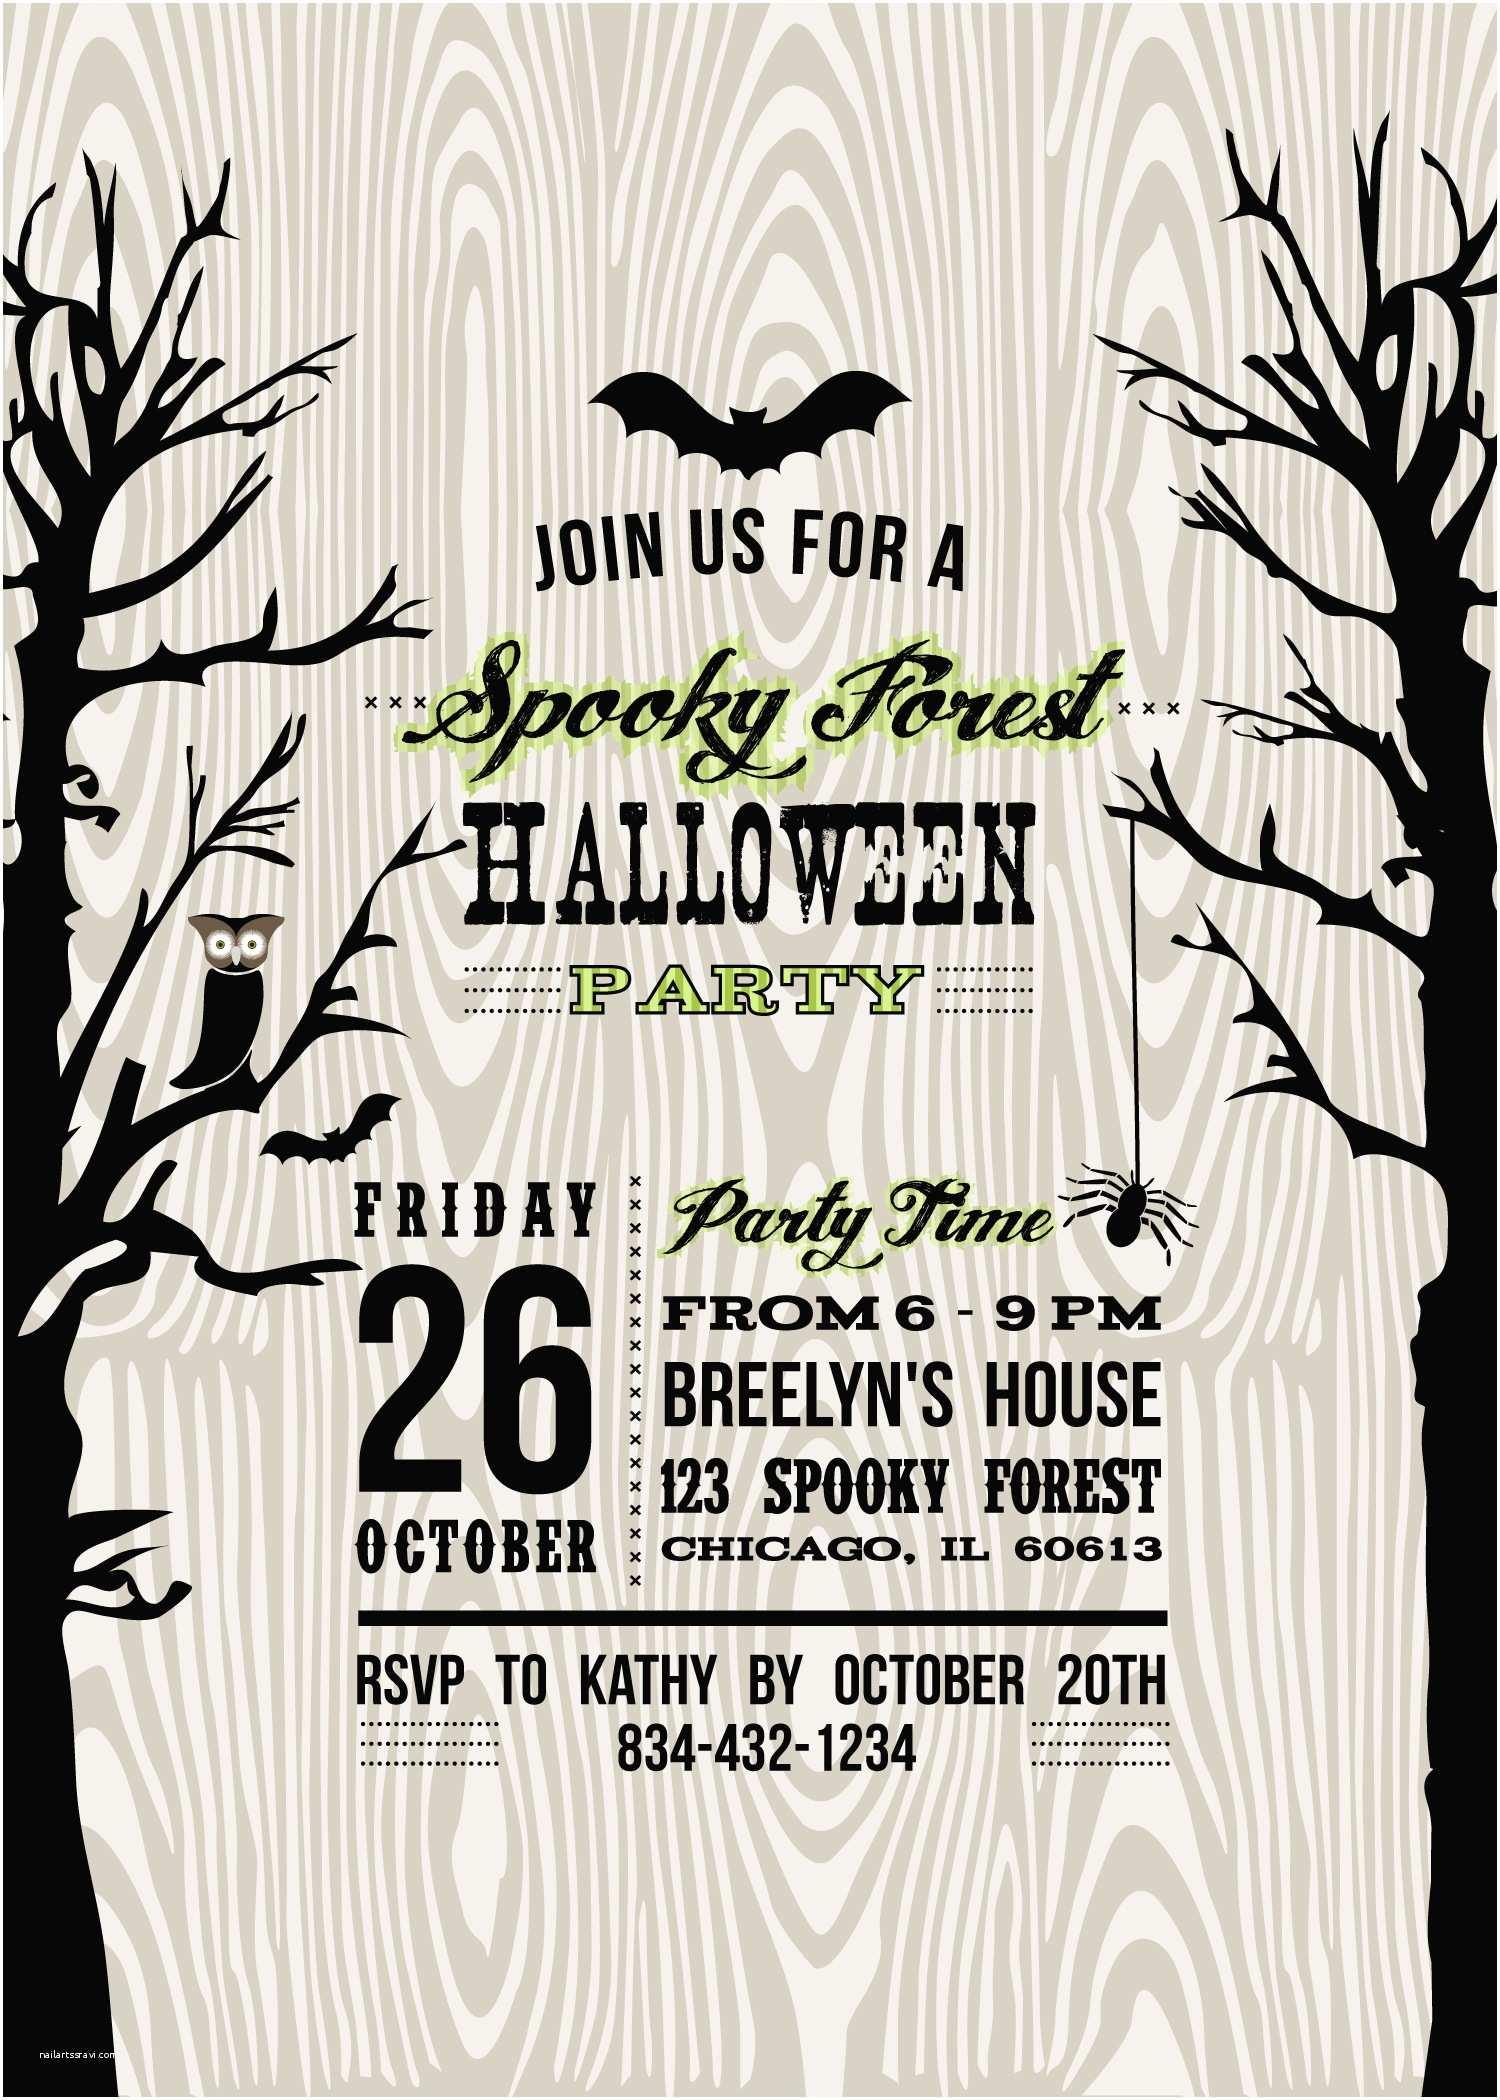 Halloween Party Invitations Templates Lucas Halloween Party 2012 anders Ruff Custom Designs Llc